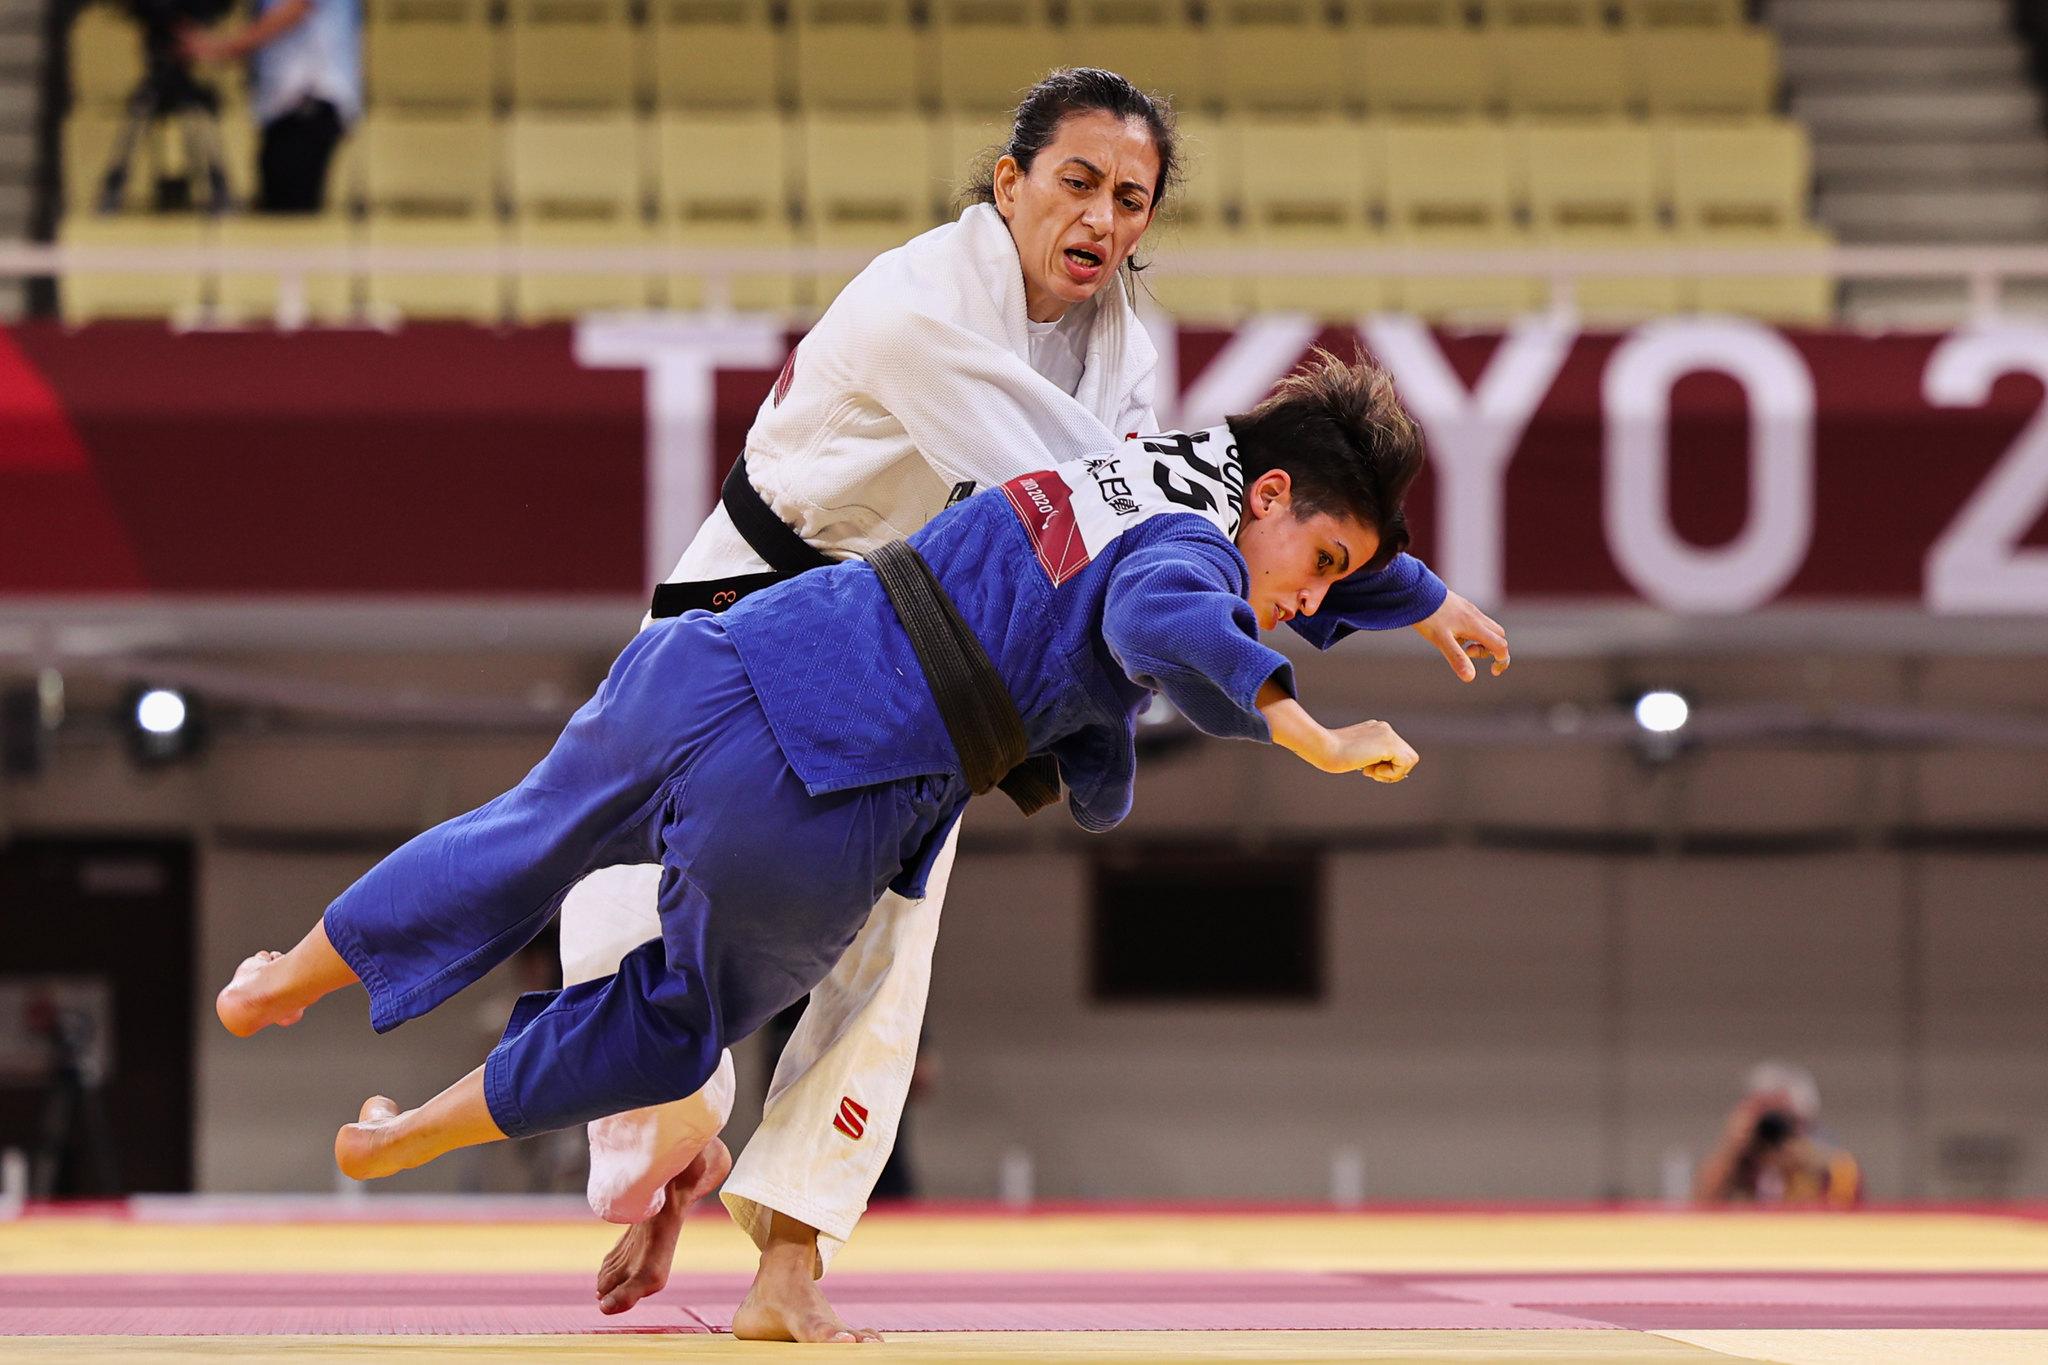 Lúcia Araújo de judogui branco derruba Laura Gonzalez que veste um jugogui azul